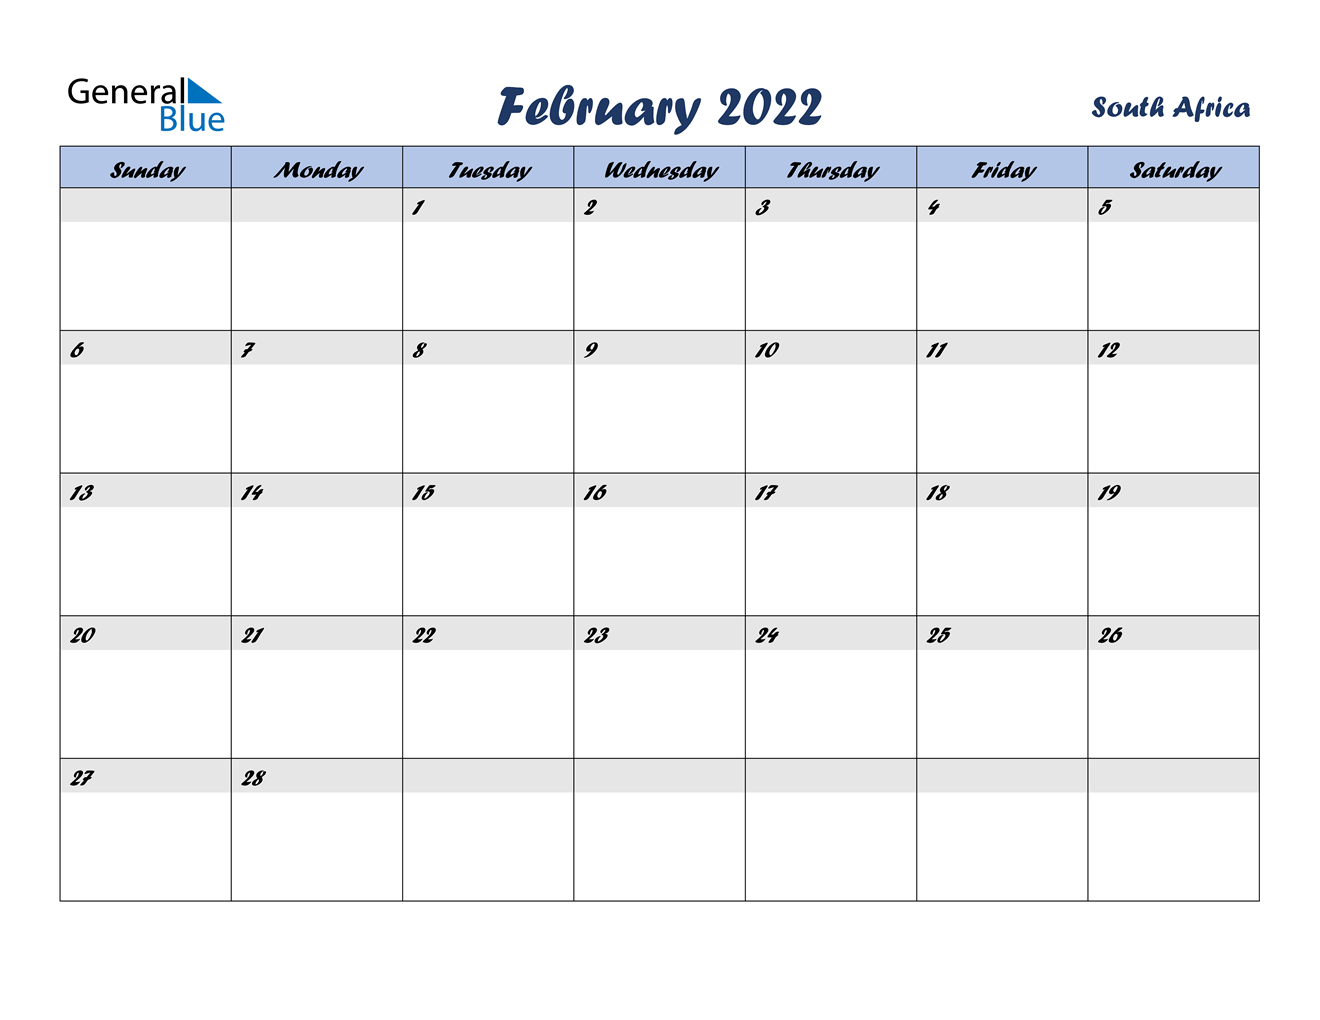 February 2022 Calendar - South Africa Intended For Printable Februaryy 2022 Calendar